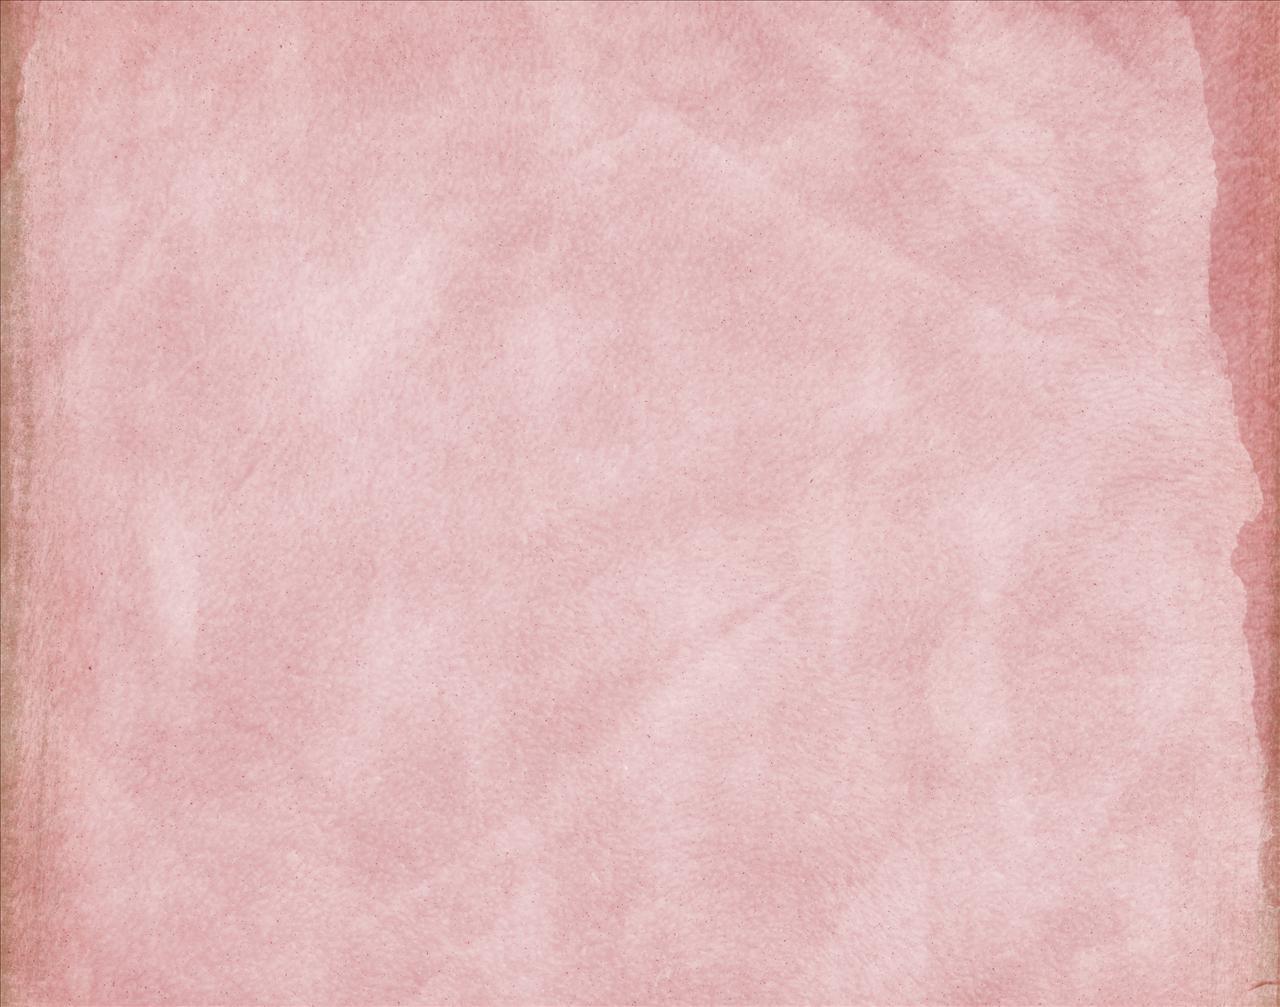 Fundos rosa Hd Vintage rosa download Vintage Rosa Hd Wallpaper